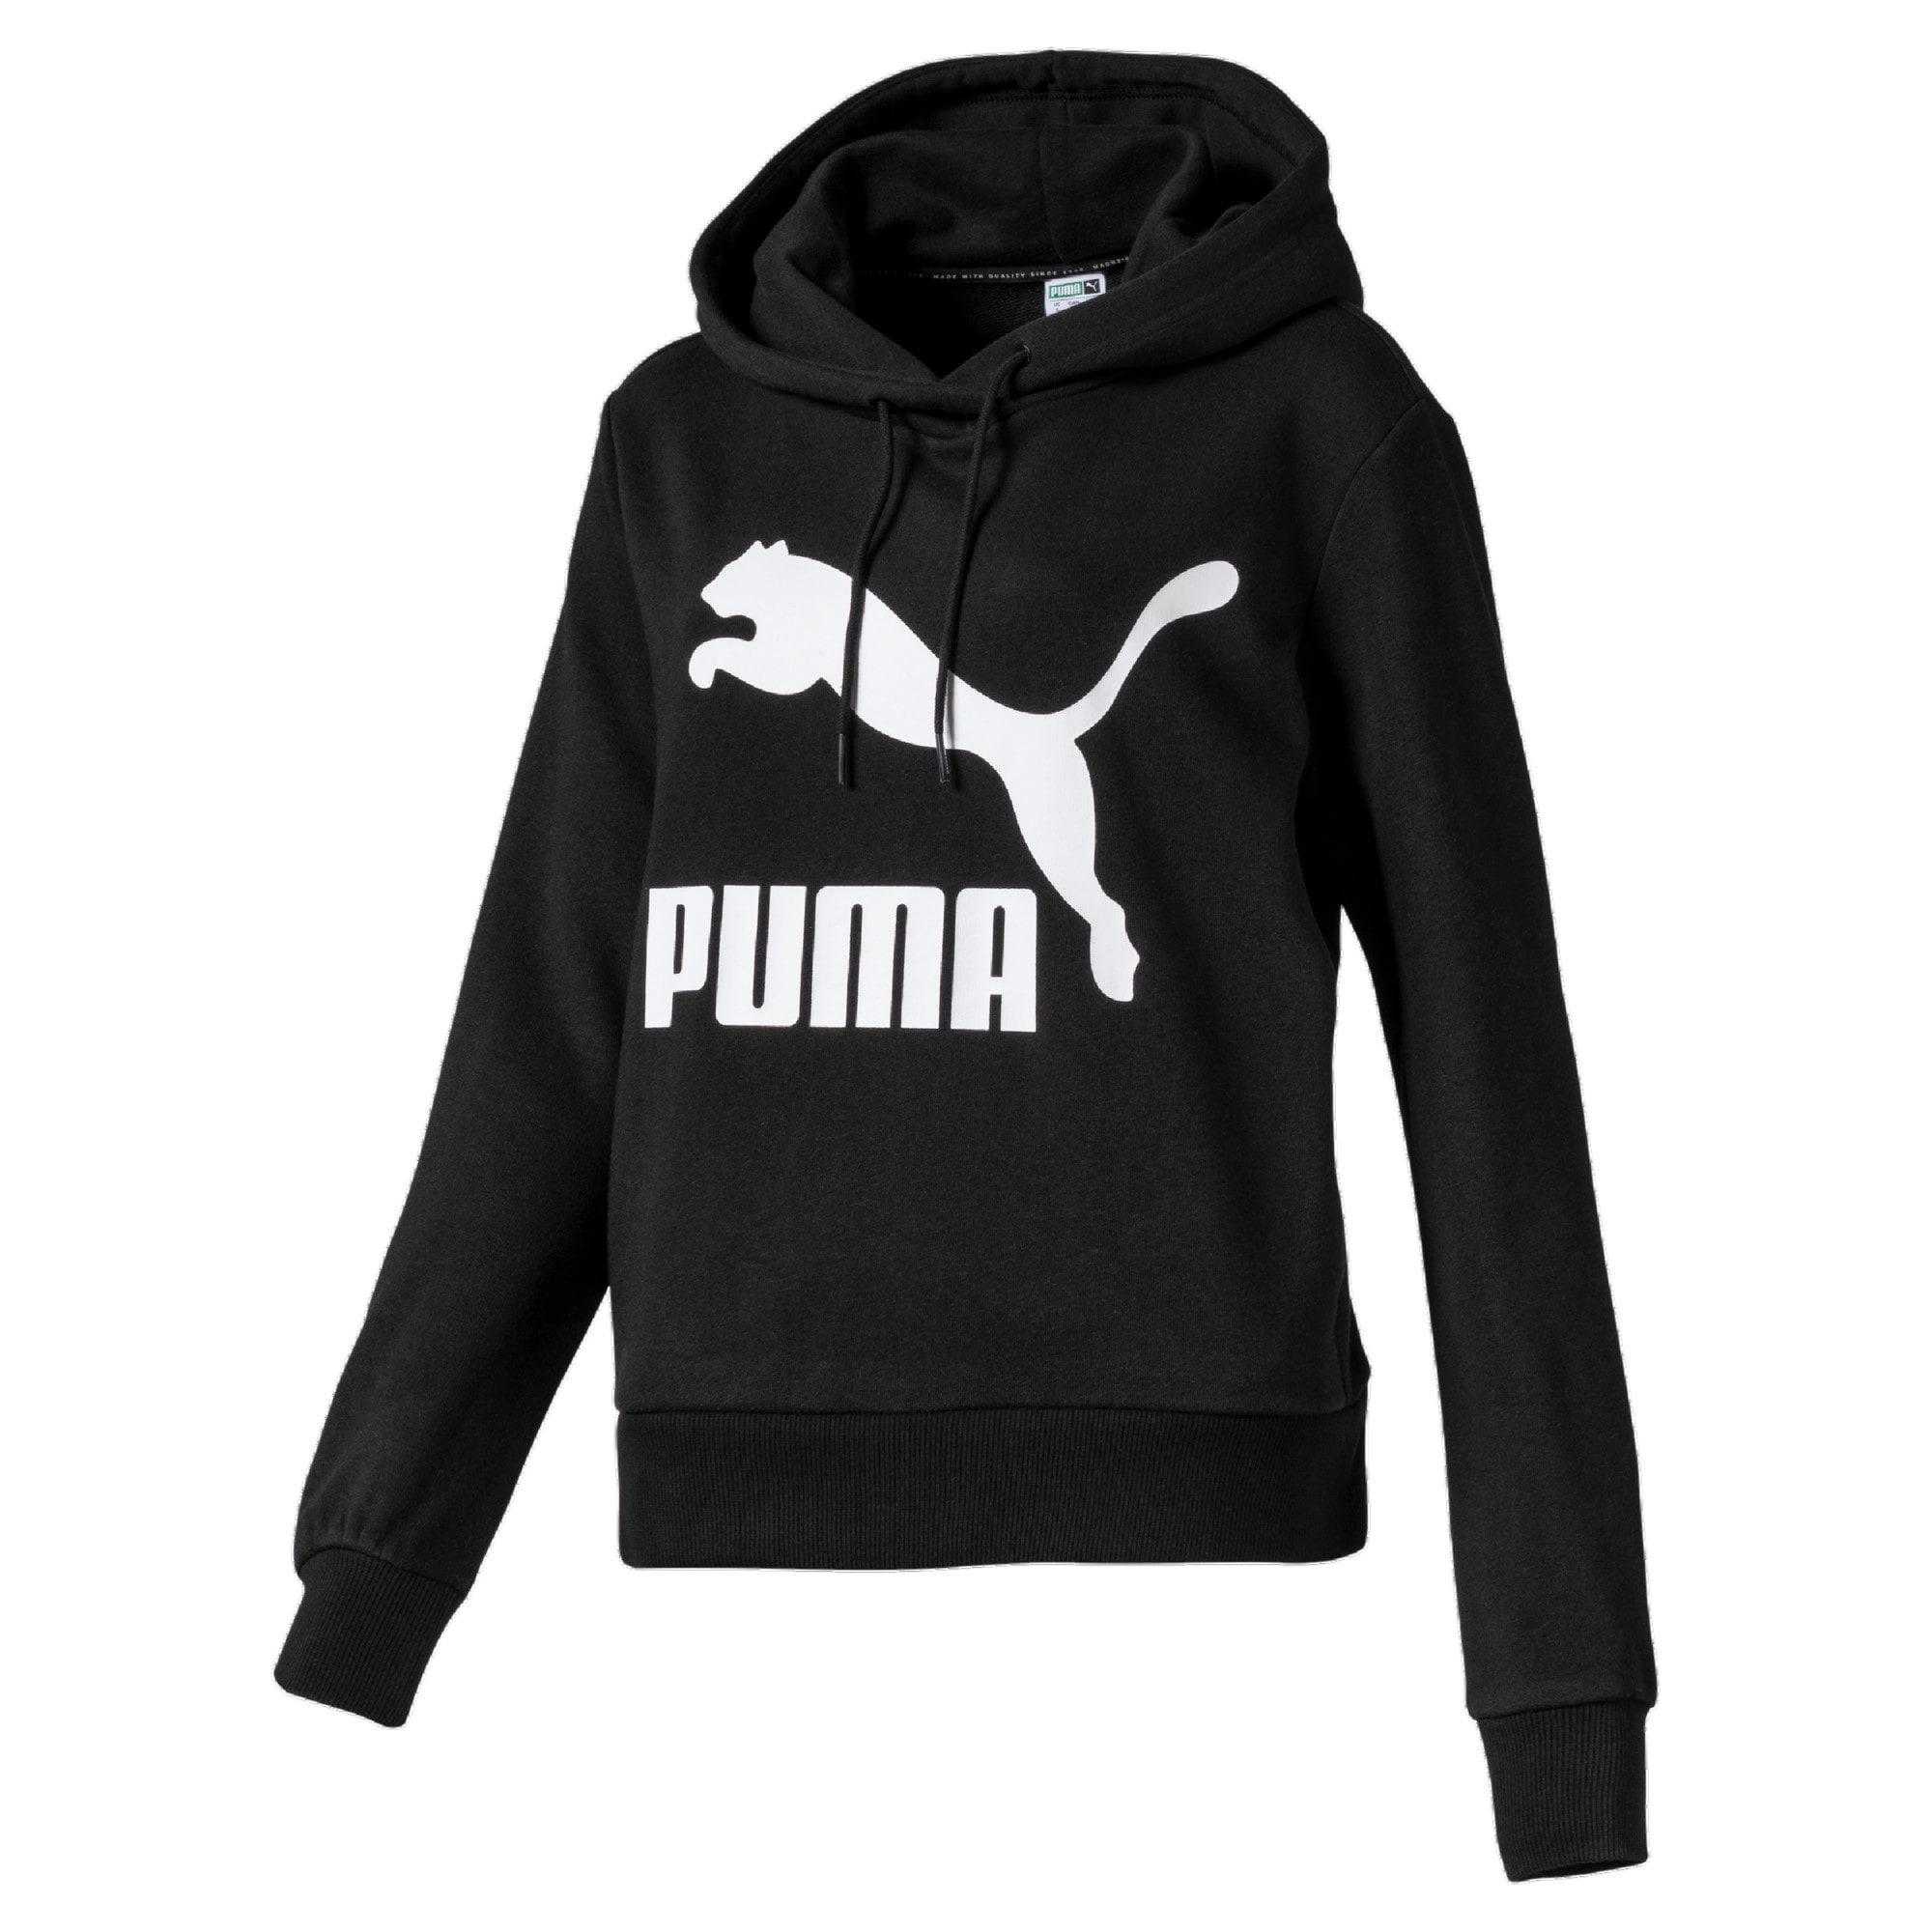 Thumbnail 1 of Classics Women's Logo Hoodie, Puma Black, medium